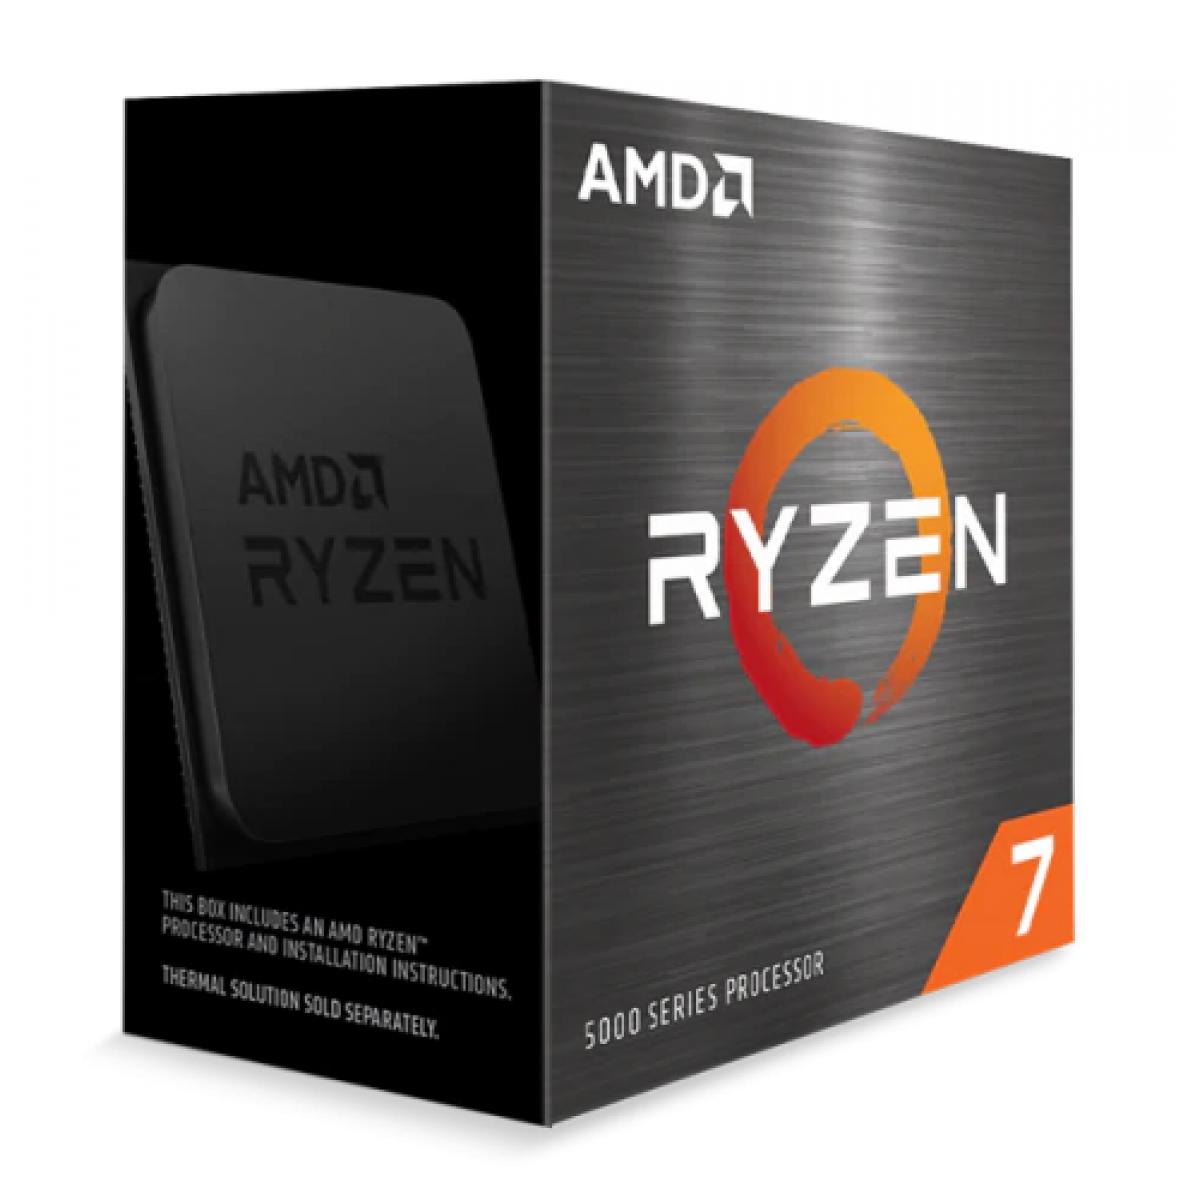 Kit Upgrade ASUS TUF Gaming Radeon RX 6800 XT + AMD Ryzen 7 5800X + Brinde Jogo Dirt 5